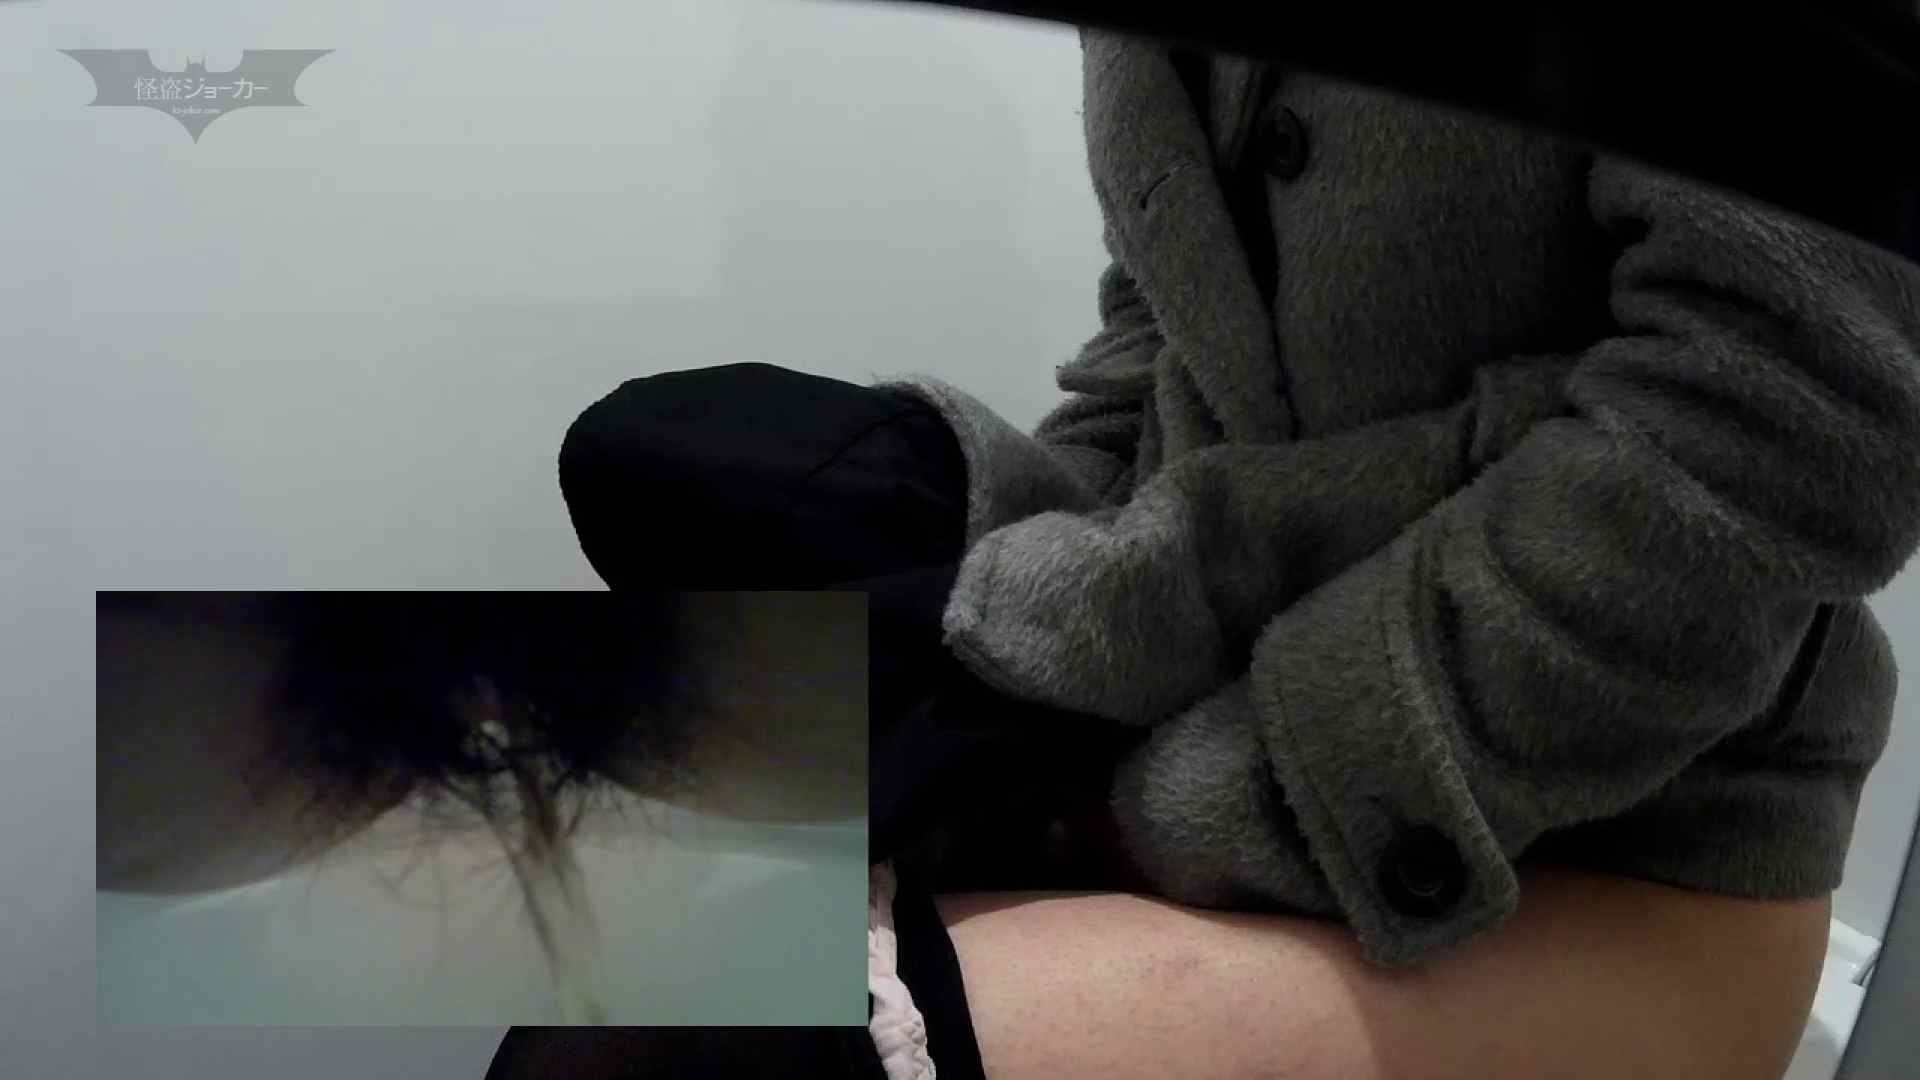 有名大学女性洗面所 vol.58 アンダーヘアーも冬支度? 洗面所 | 排泄  111画像 71